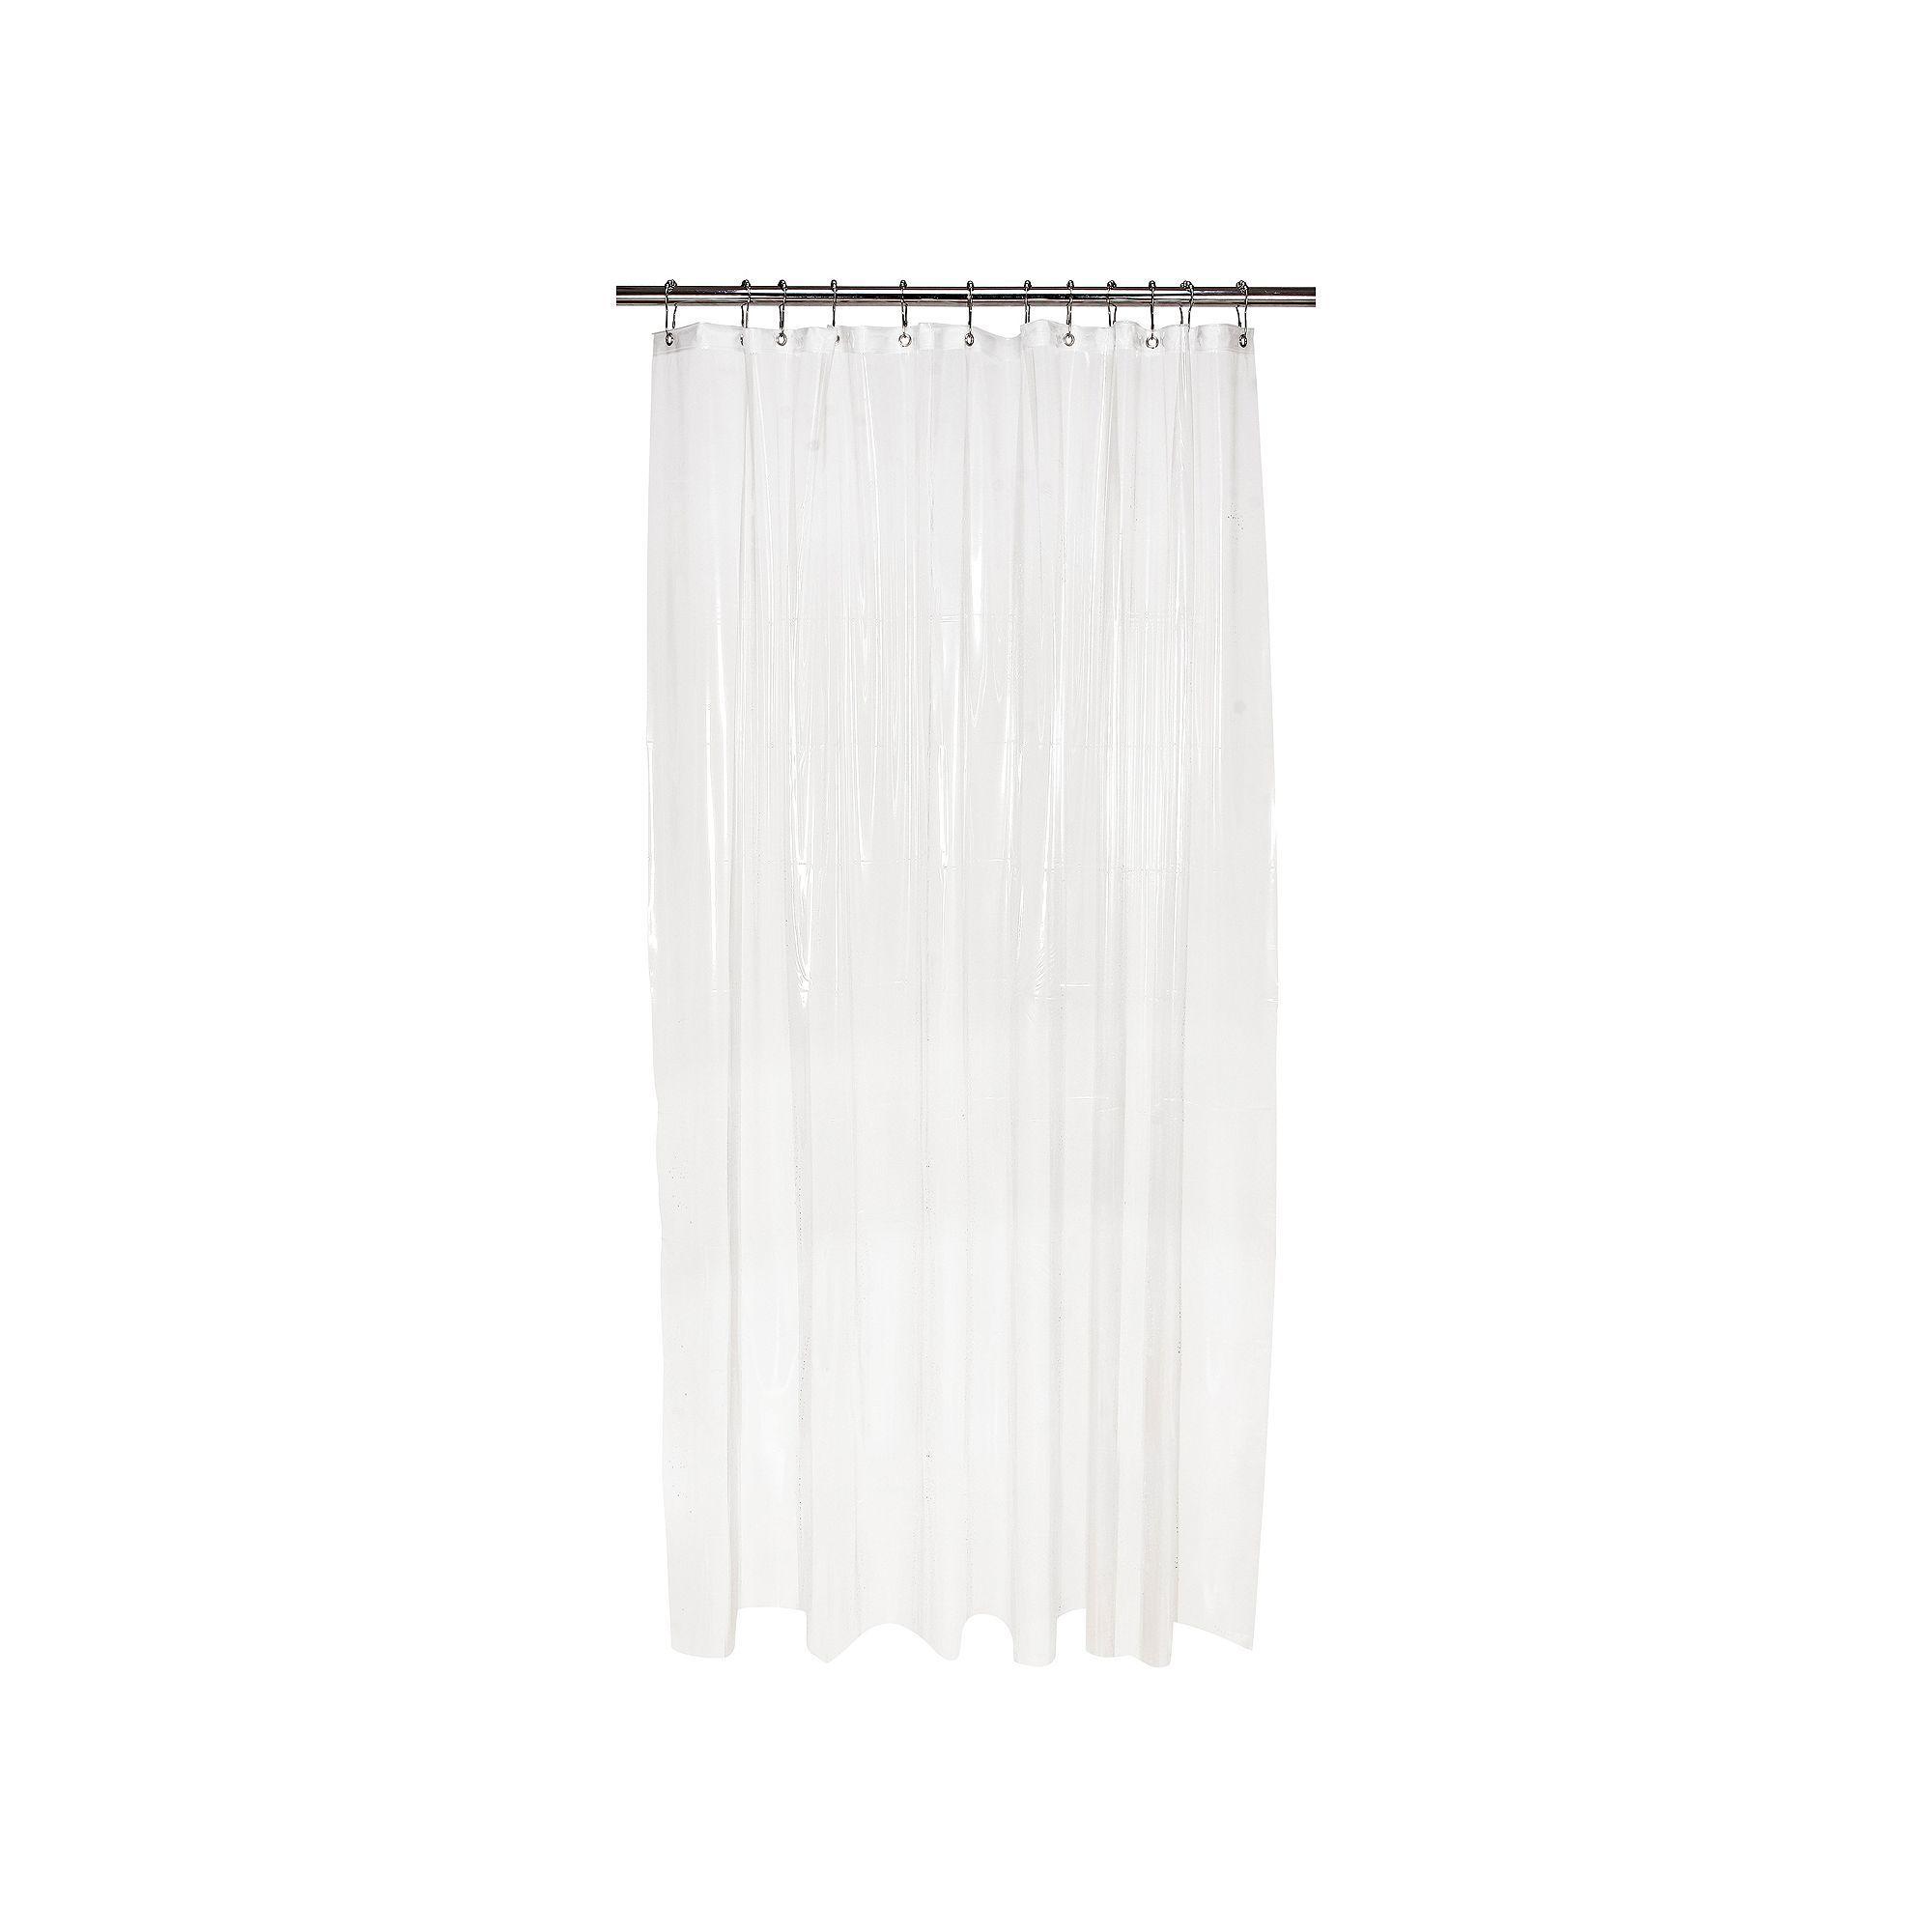 Bath Bliss Mildew Blocker Heavy Gauge Shower Curtain Liner Multicolor Mold In Bathroom Wall Molding Basement Decor